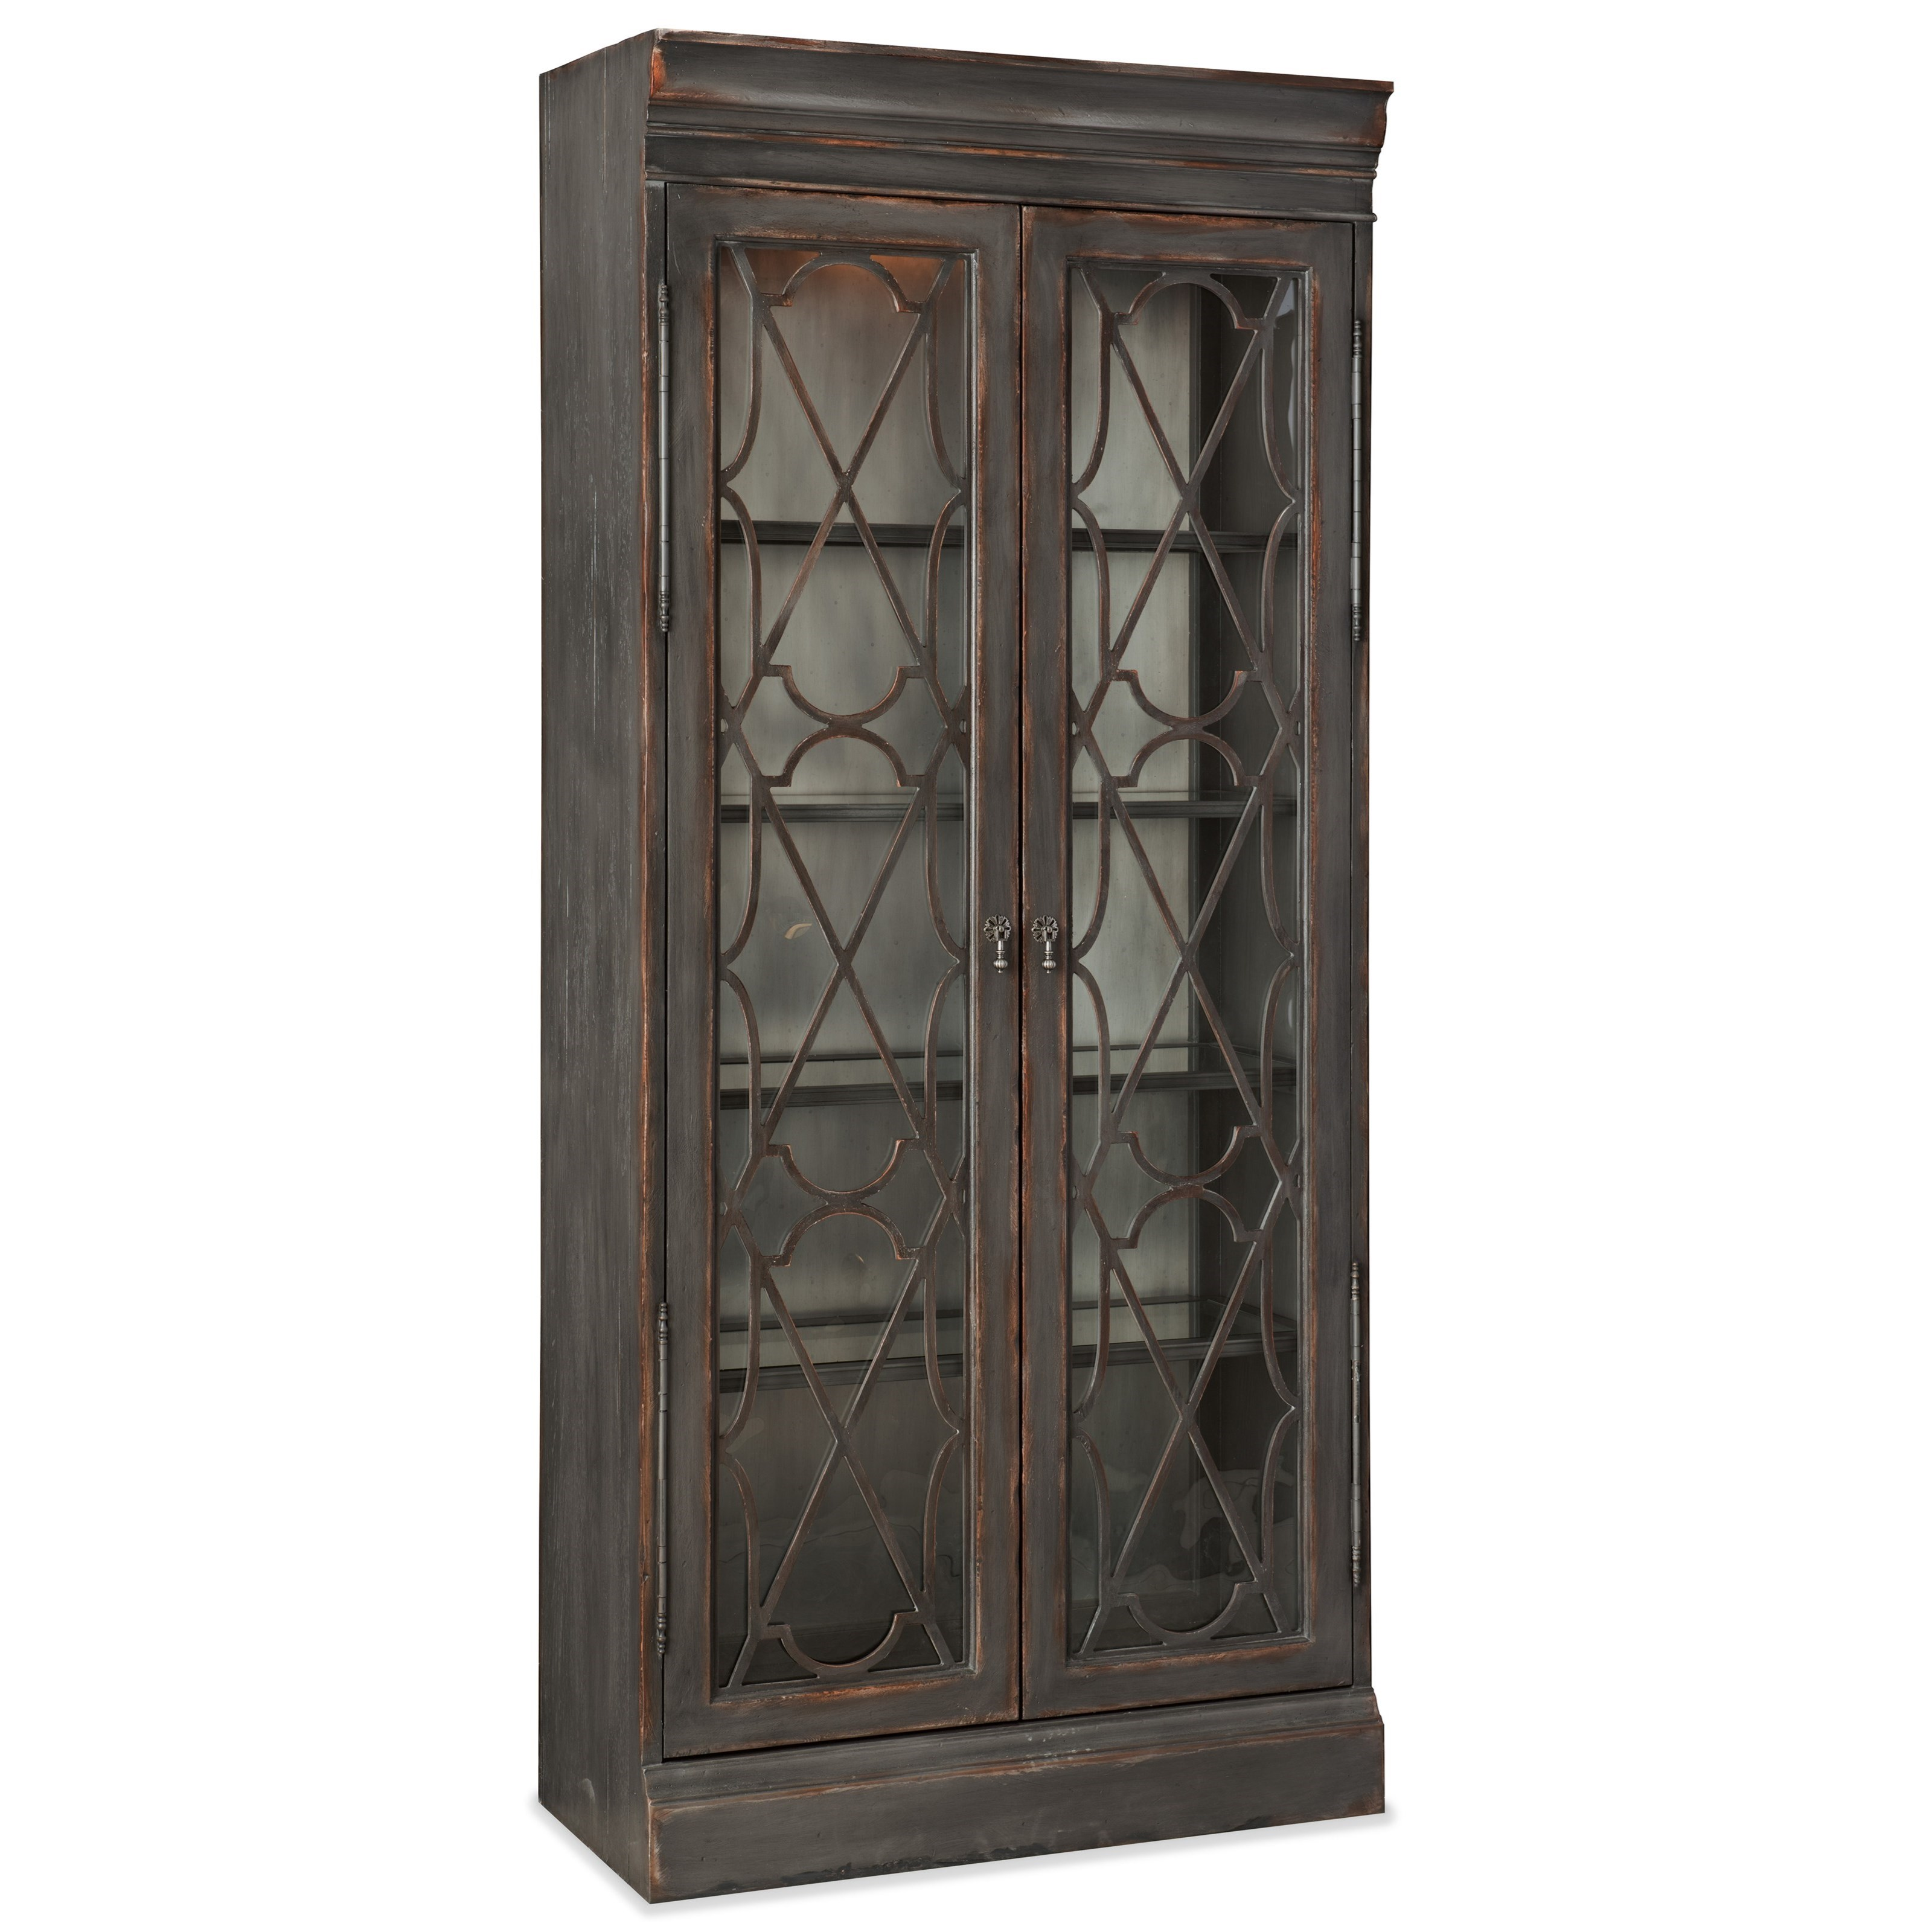 Arabella Bunching Display Cabinet by Hooker Furniture at Alison Craig Home Furnishings